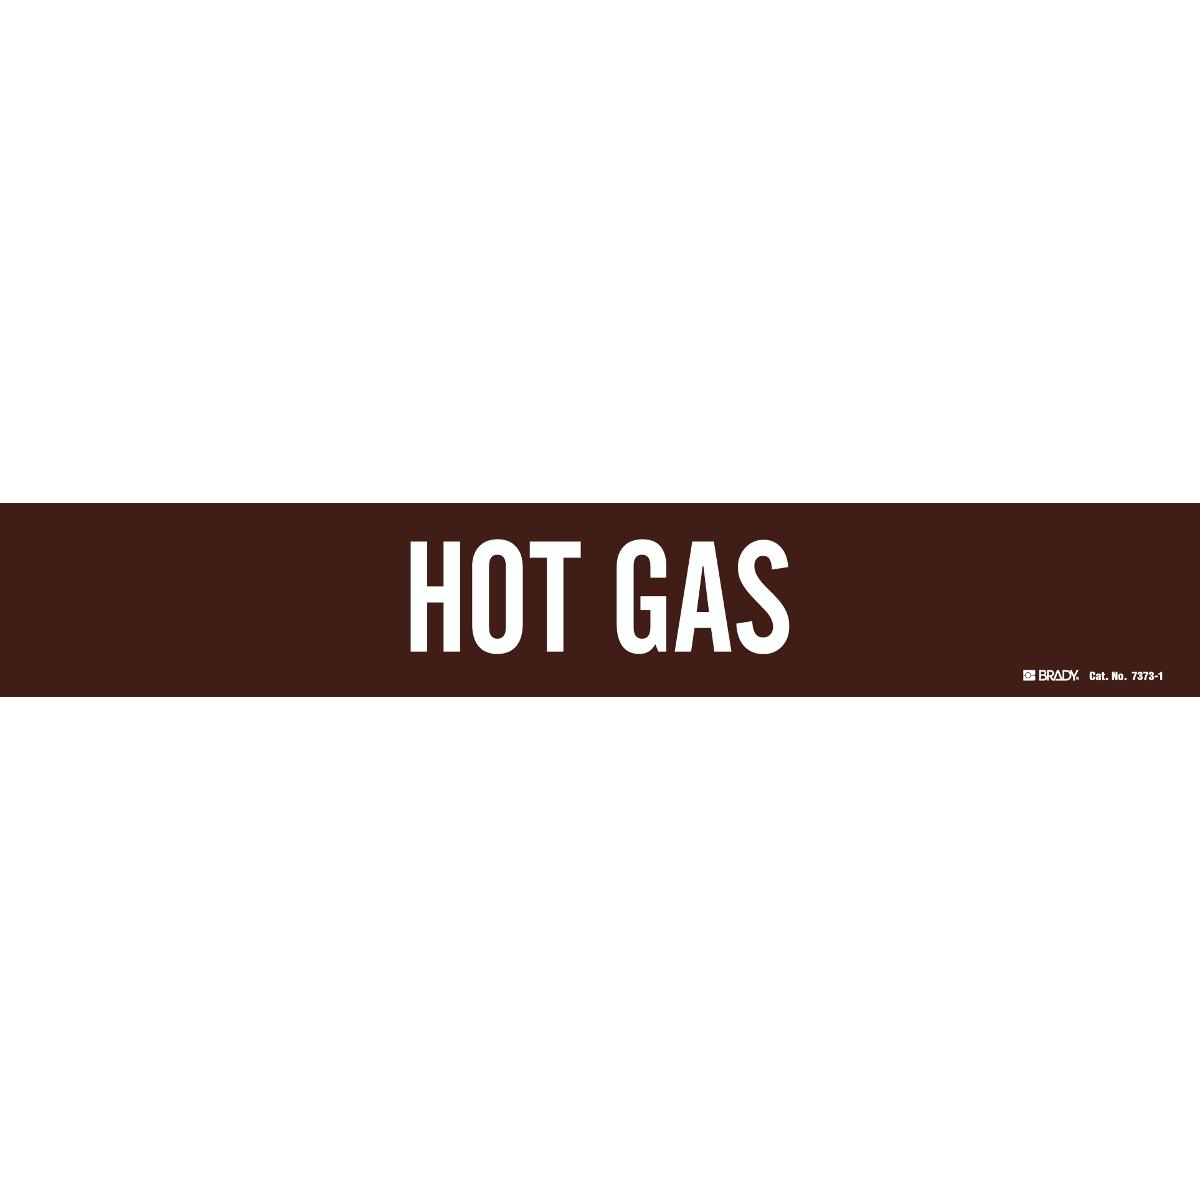 White On Brown Pressure Sensitive Vinyl Brady 7373-1 Self-Sticking Vinyl Pipe Marker Legend Hot Gas 2 1//4 Height X 14 Width Legend Hot Gas 2 1//4 Height X 14 Width B-946